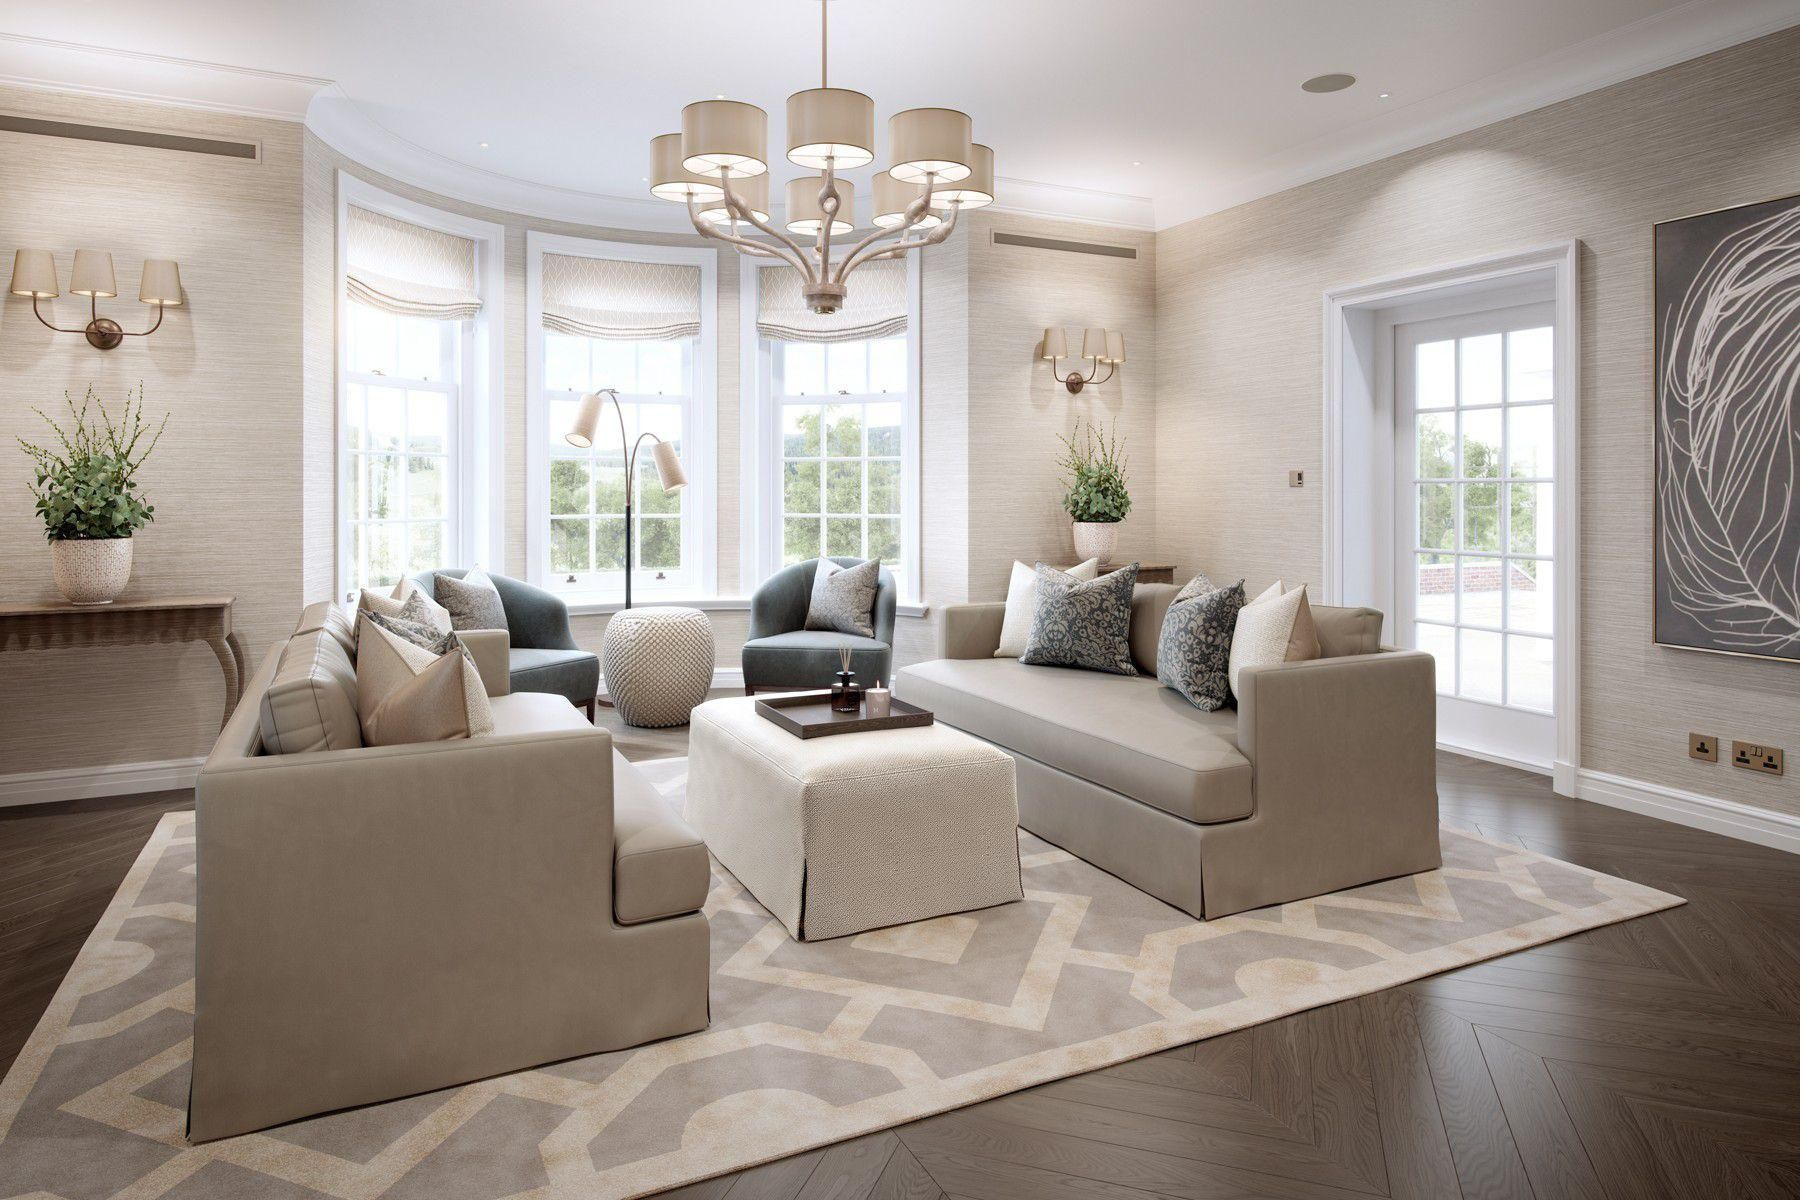 Surrey Family Home  Luxury Interior Design   Laura Hammett. Surrey Family Home  Luxury Interior Design   Laura Hammett   All